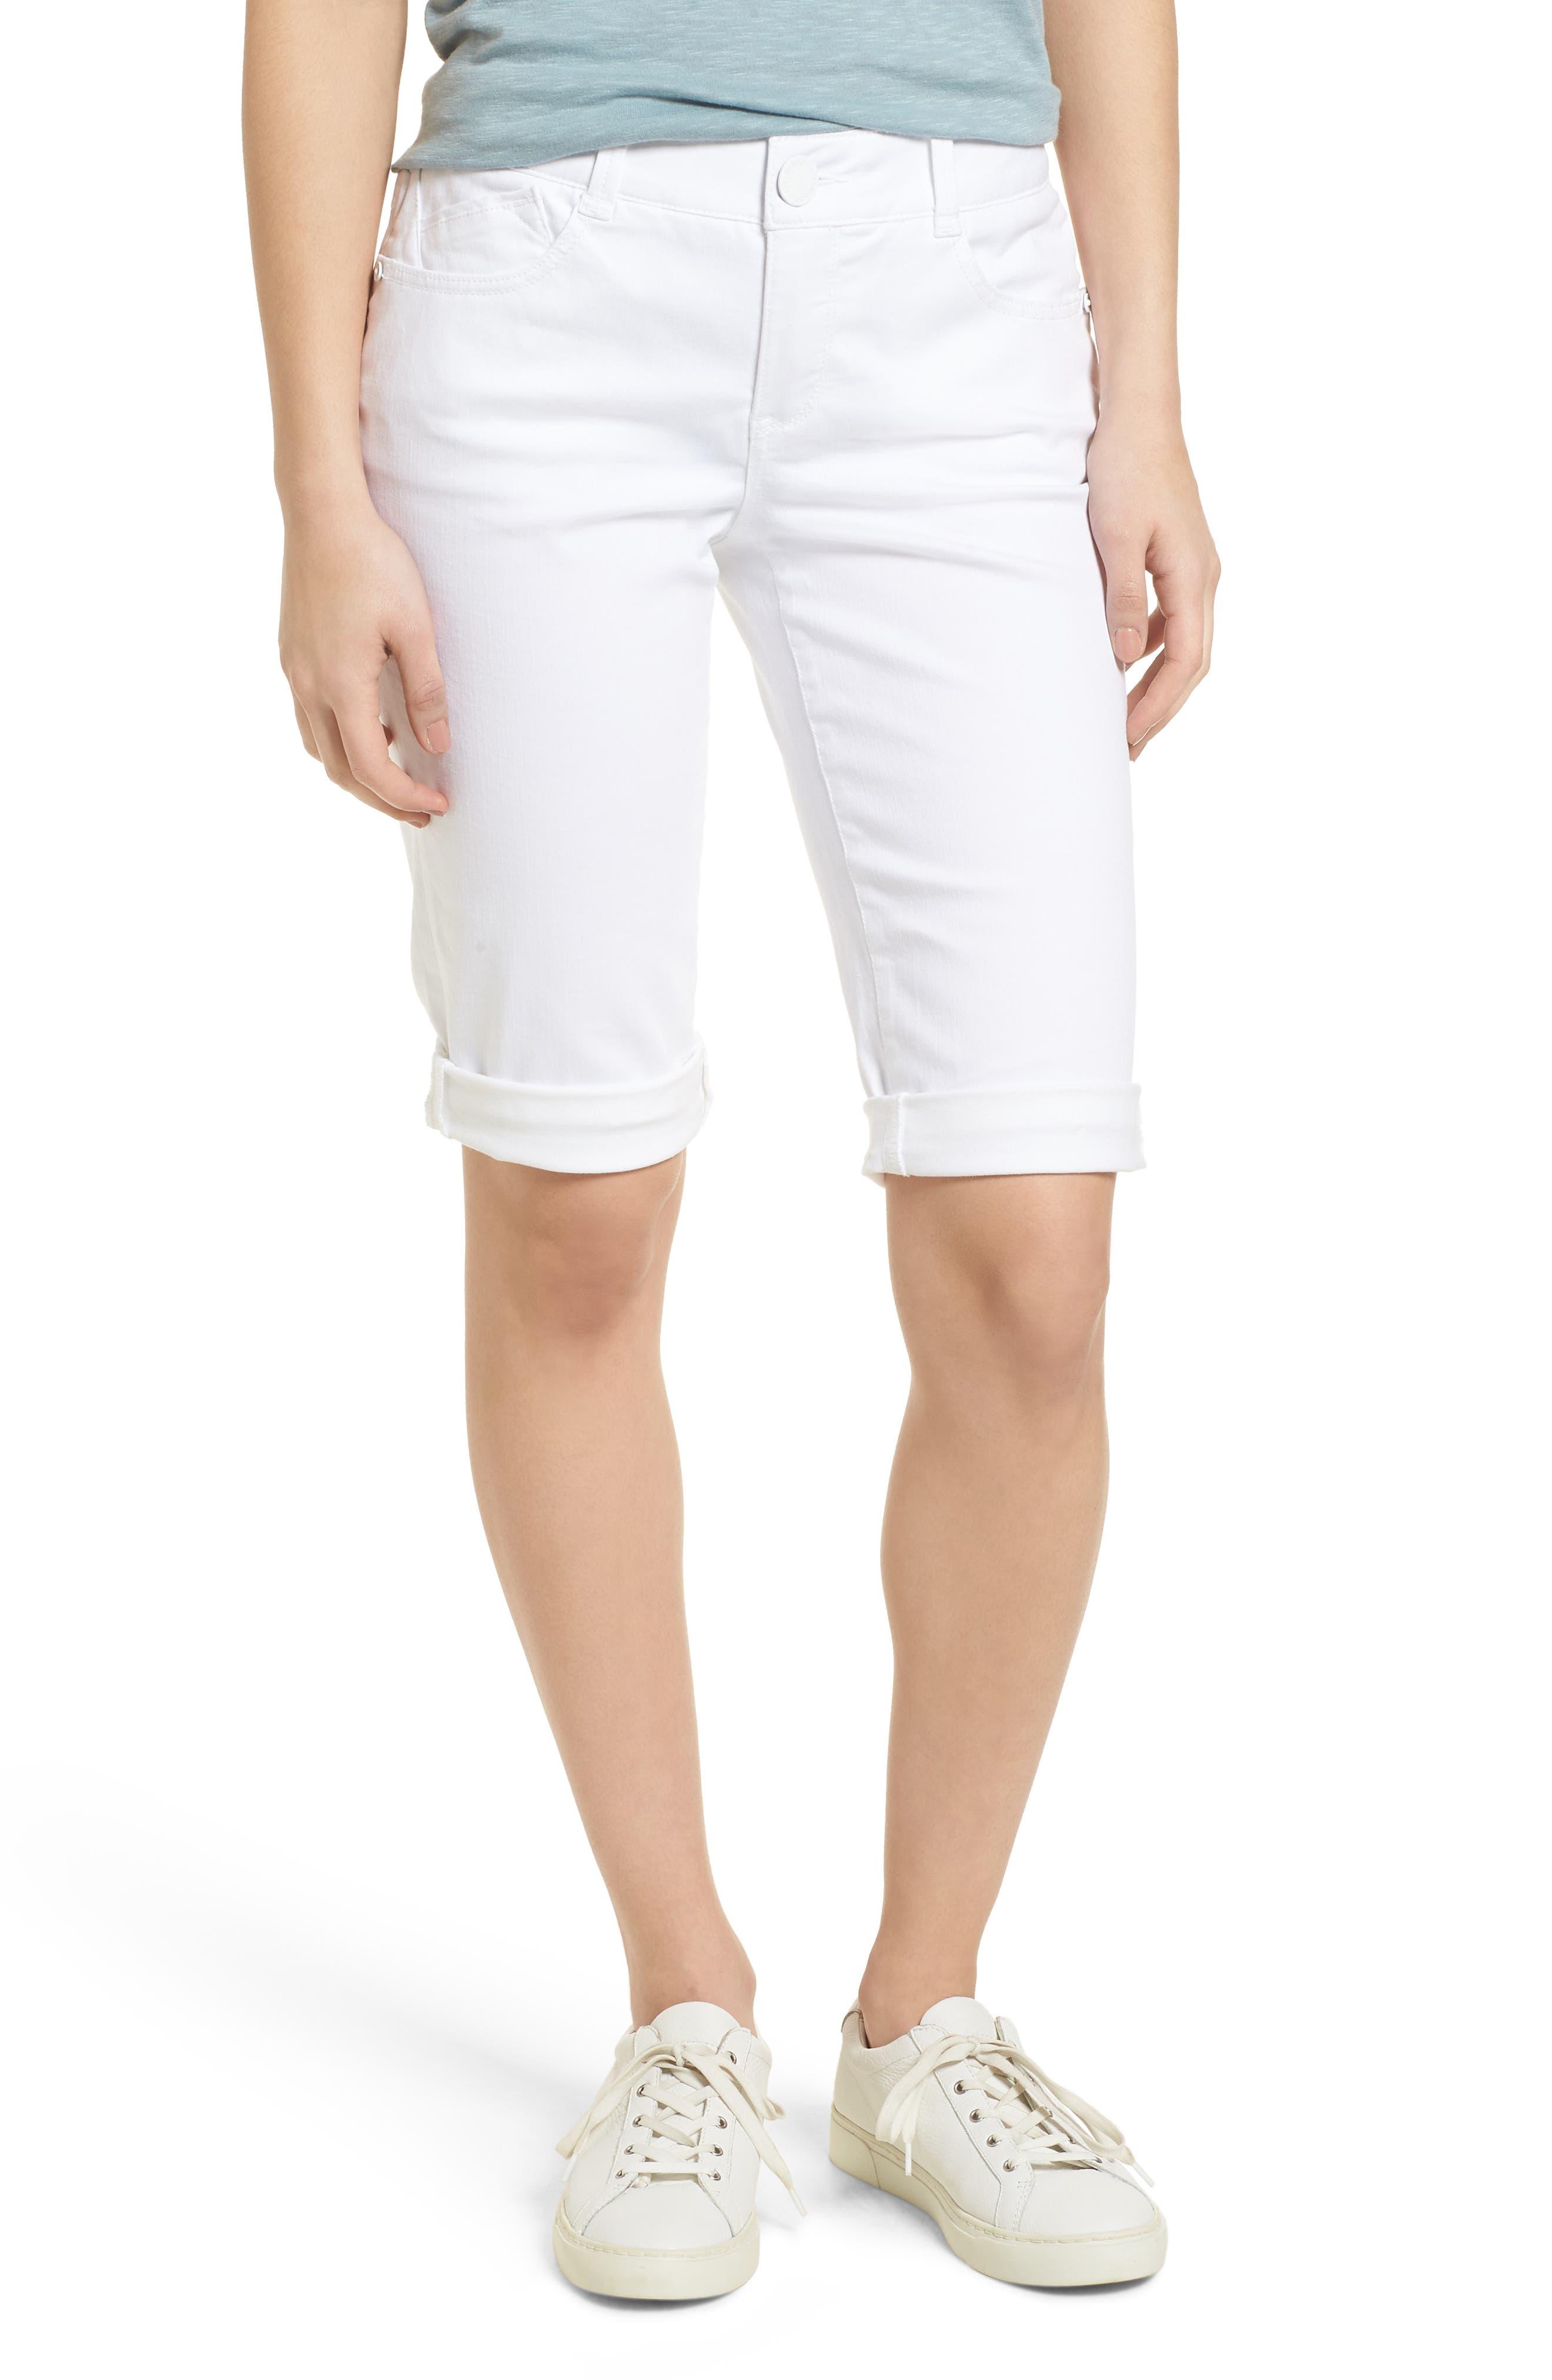 Ab-solution White Bermuda Shorts,                             Main thumbnail 1, color,                             OPTIC WHITE